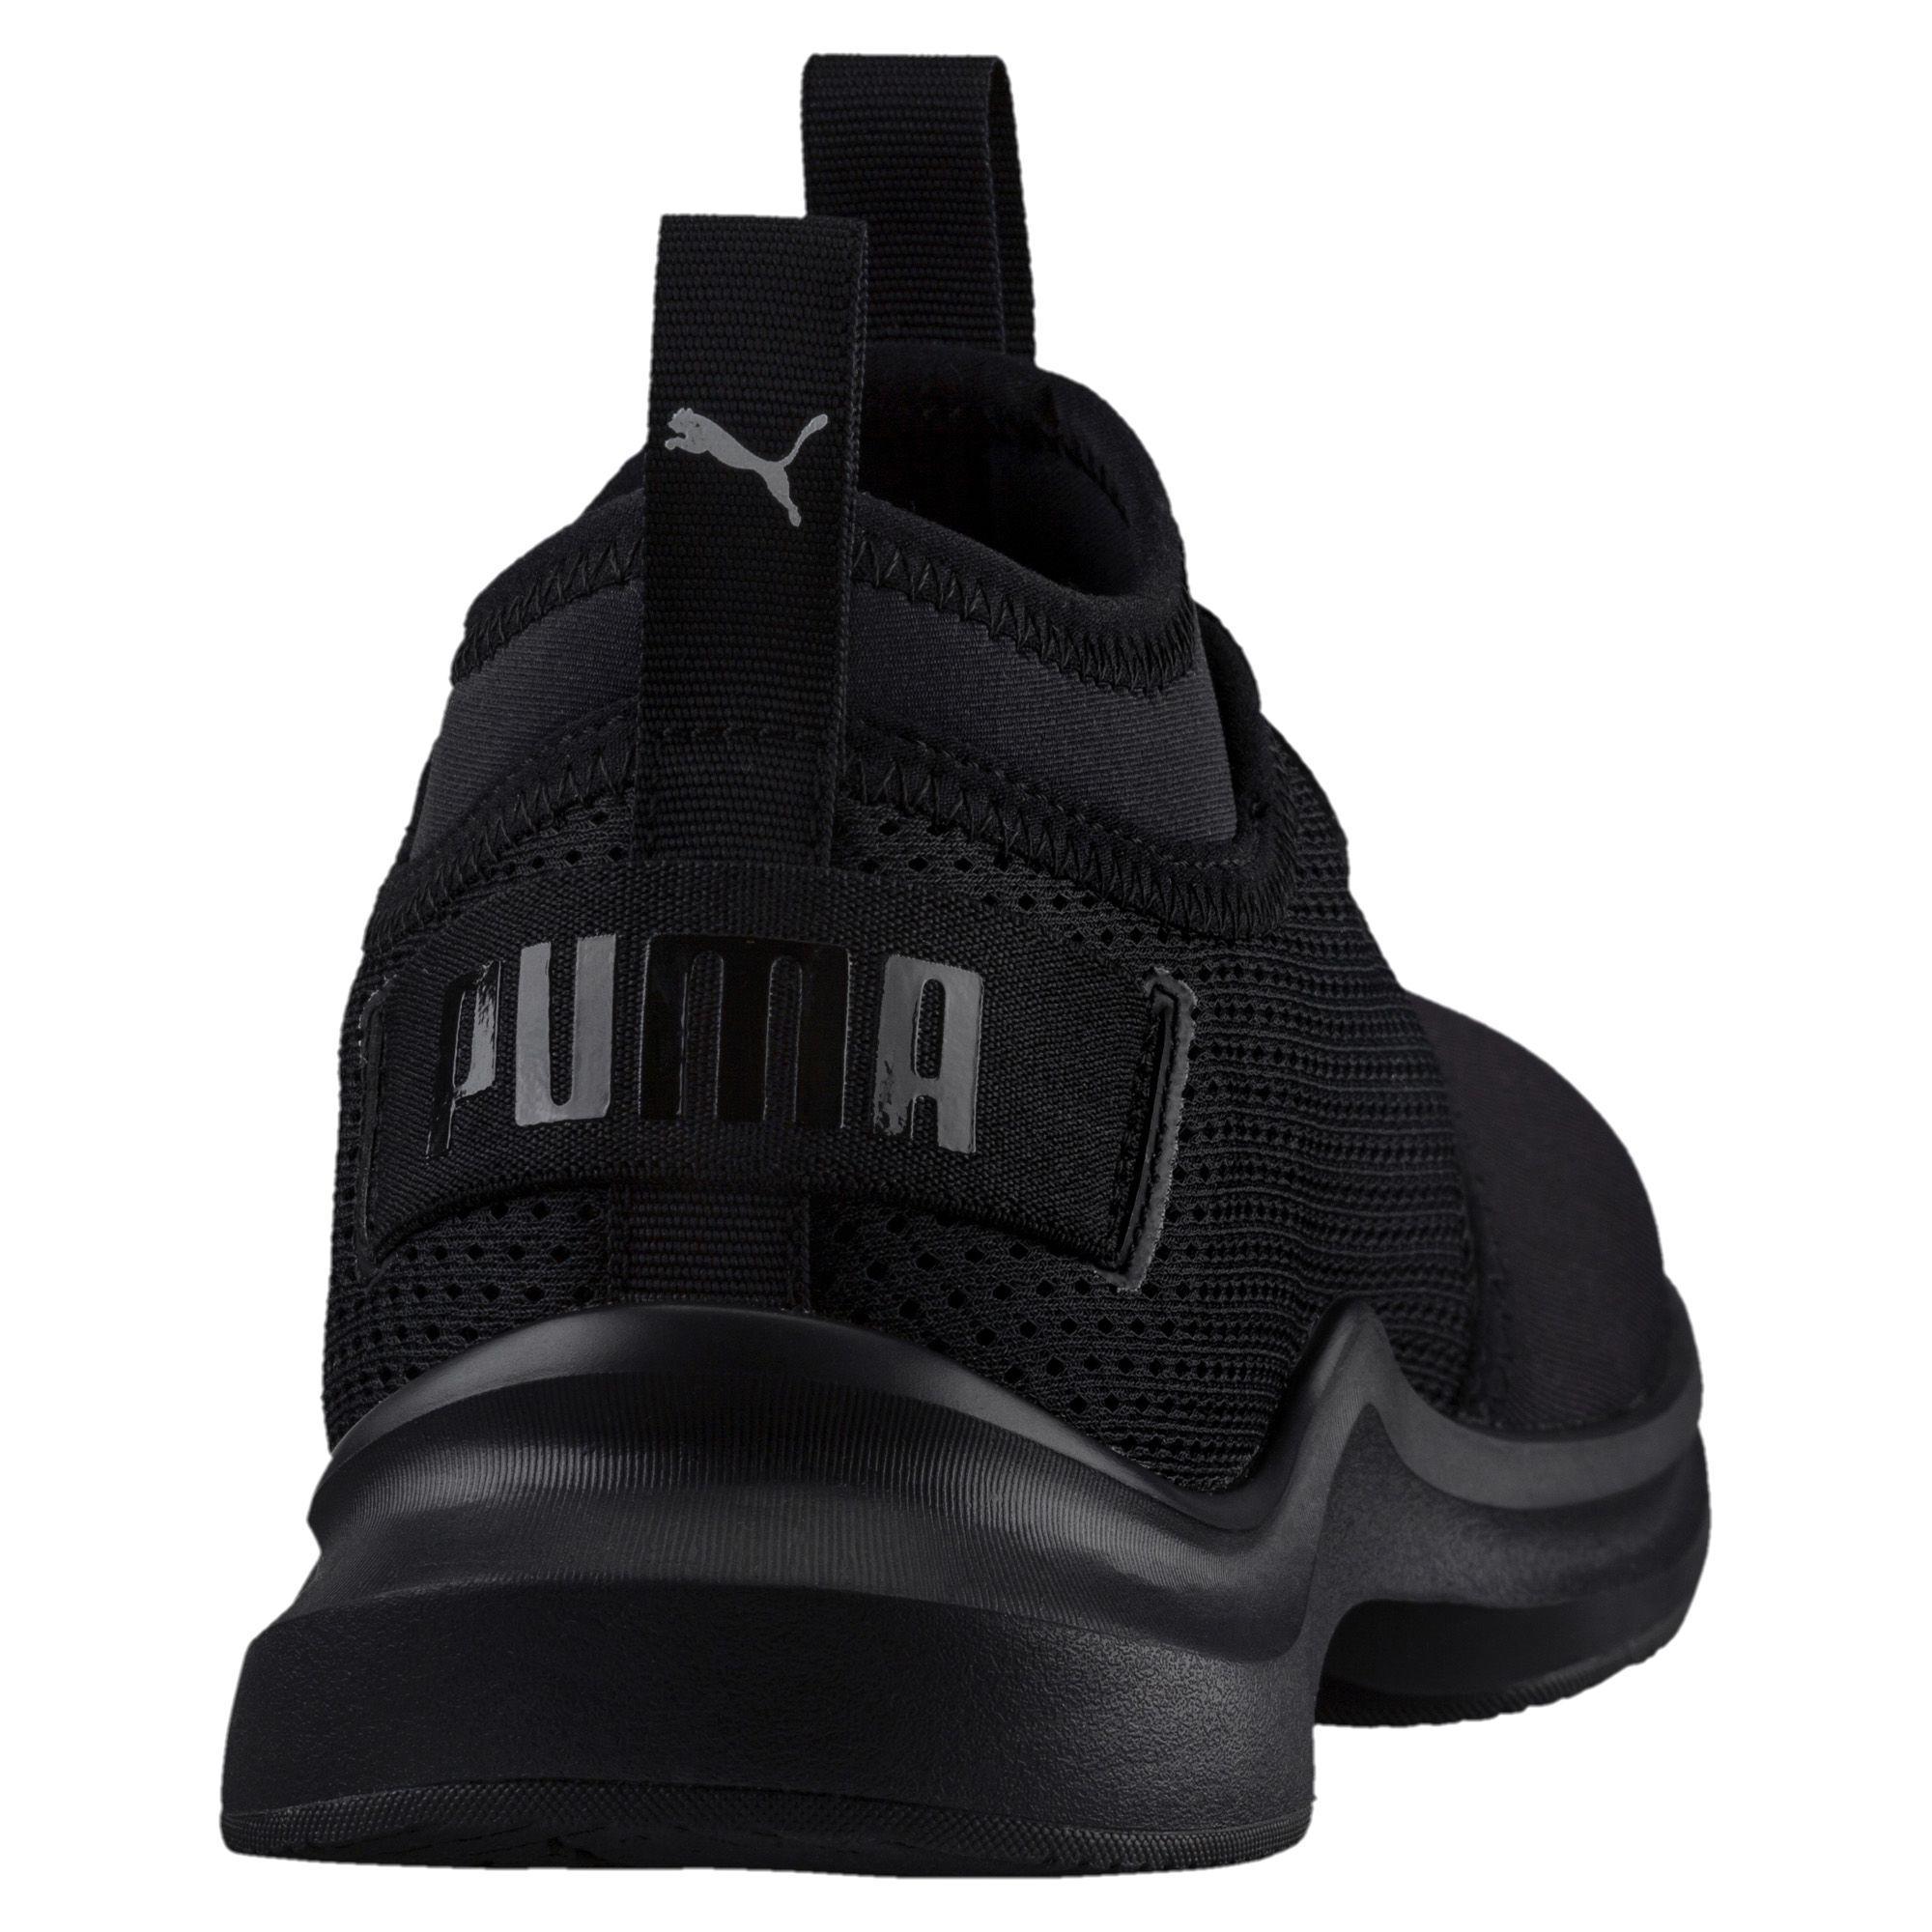 Lyst - PUMA Phenom Lo Women s Training Shoes in Black for Men b66308e10